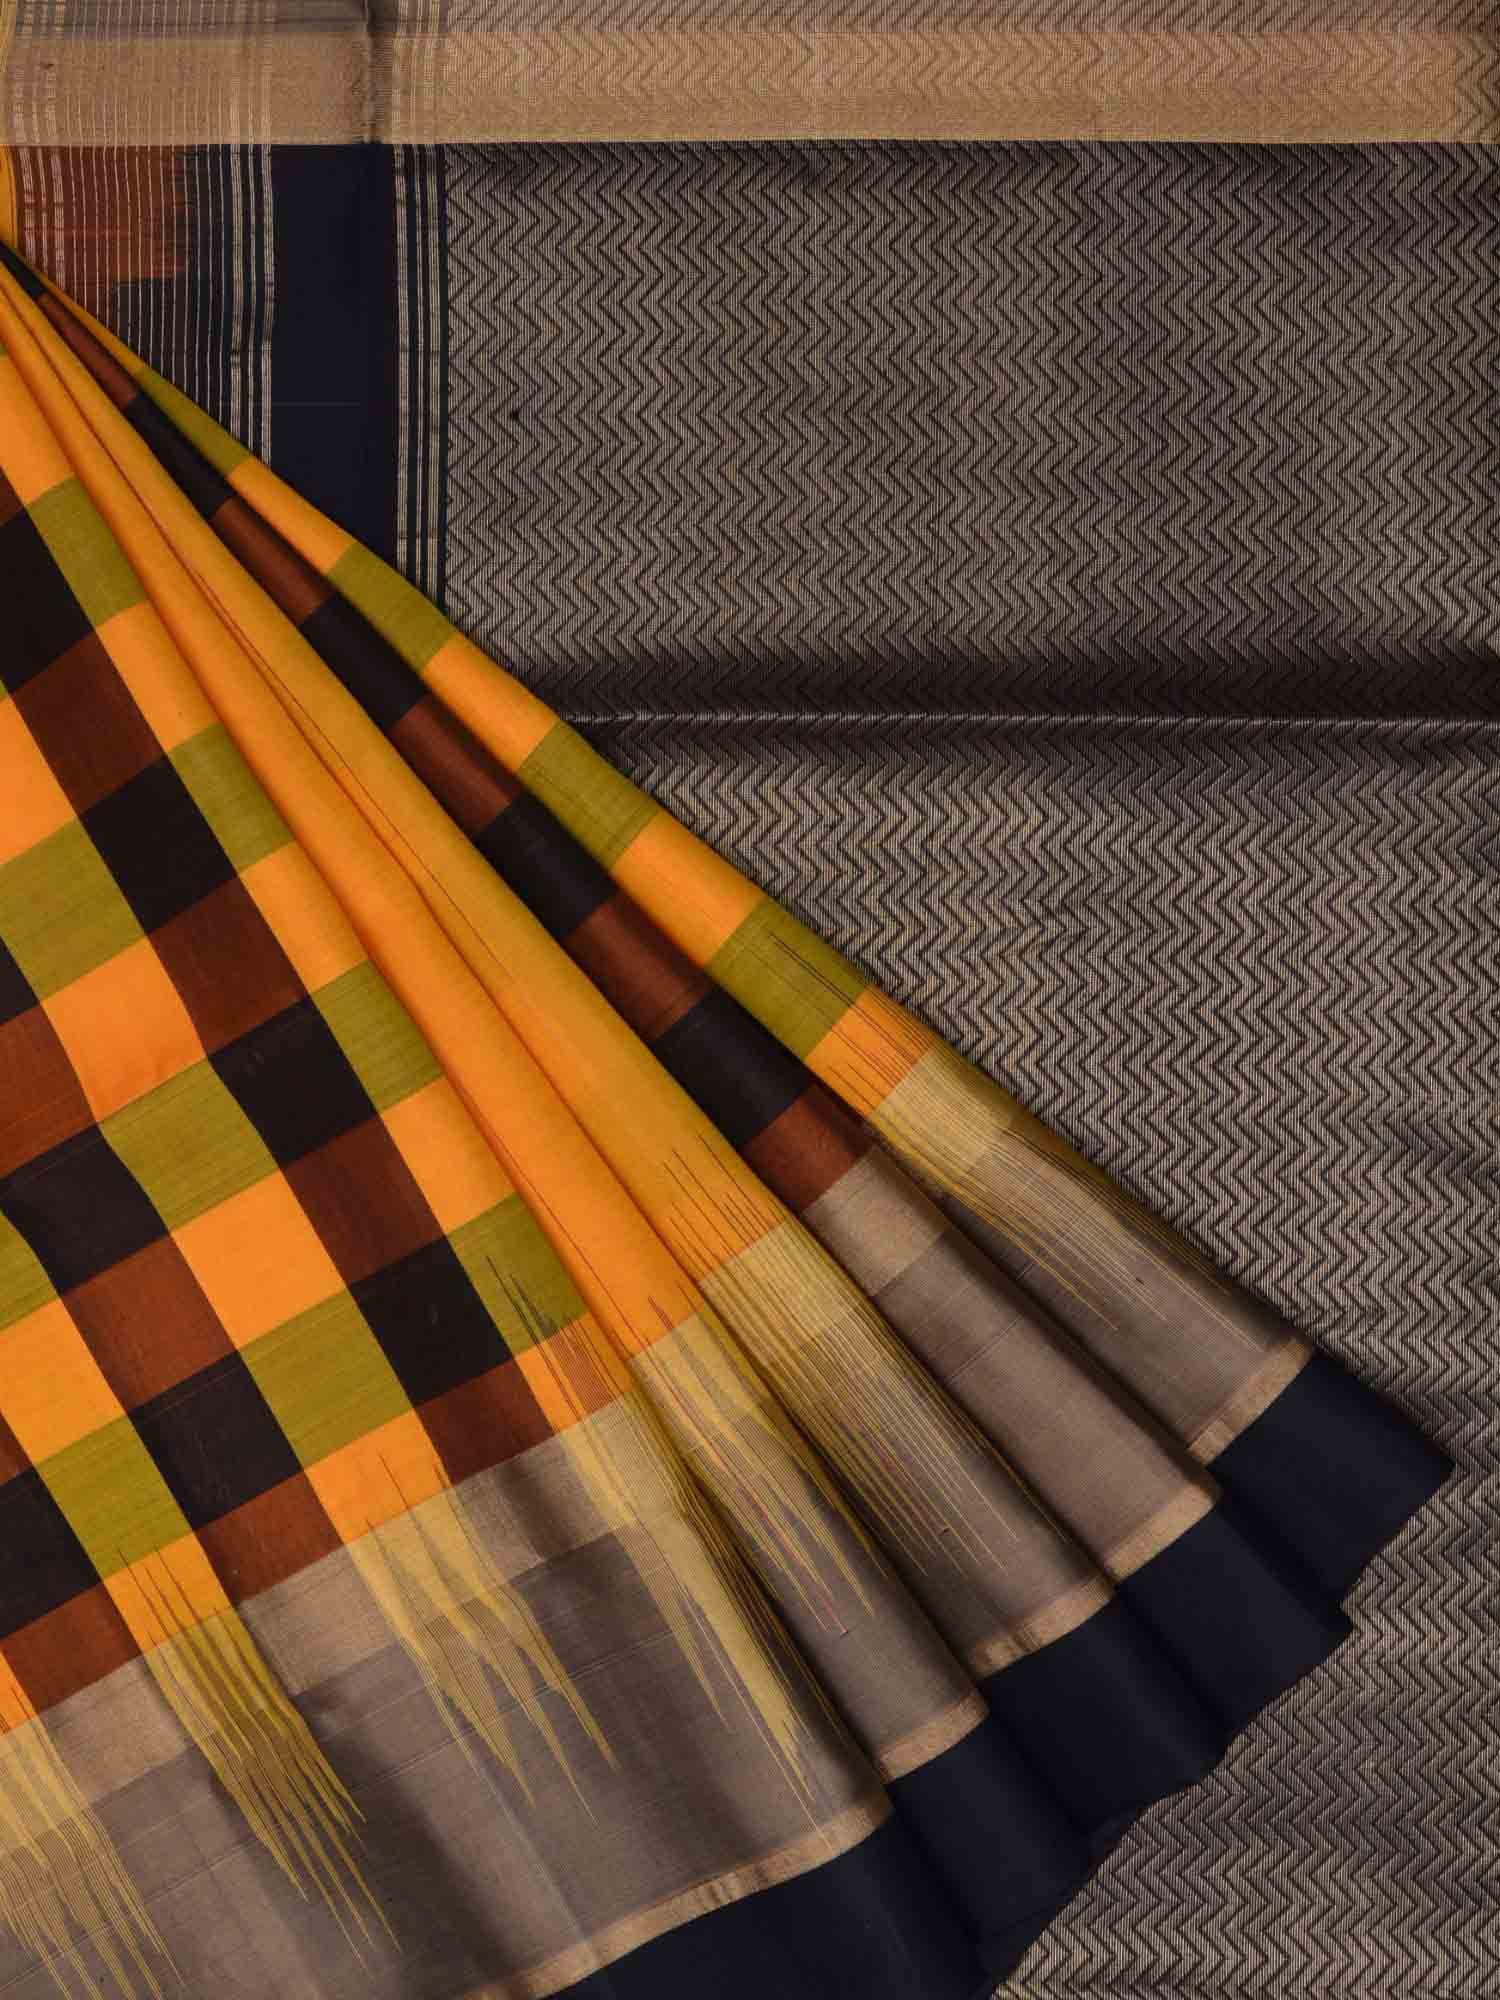 Orange pochampally ikat silk handloom saree with checks design